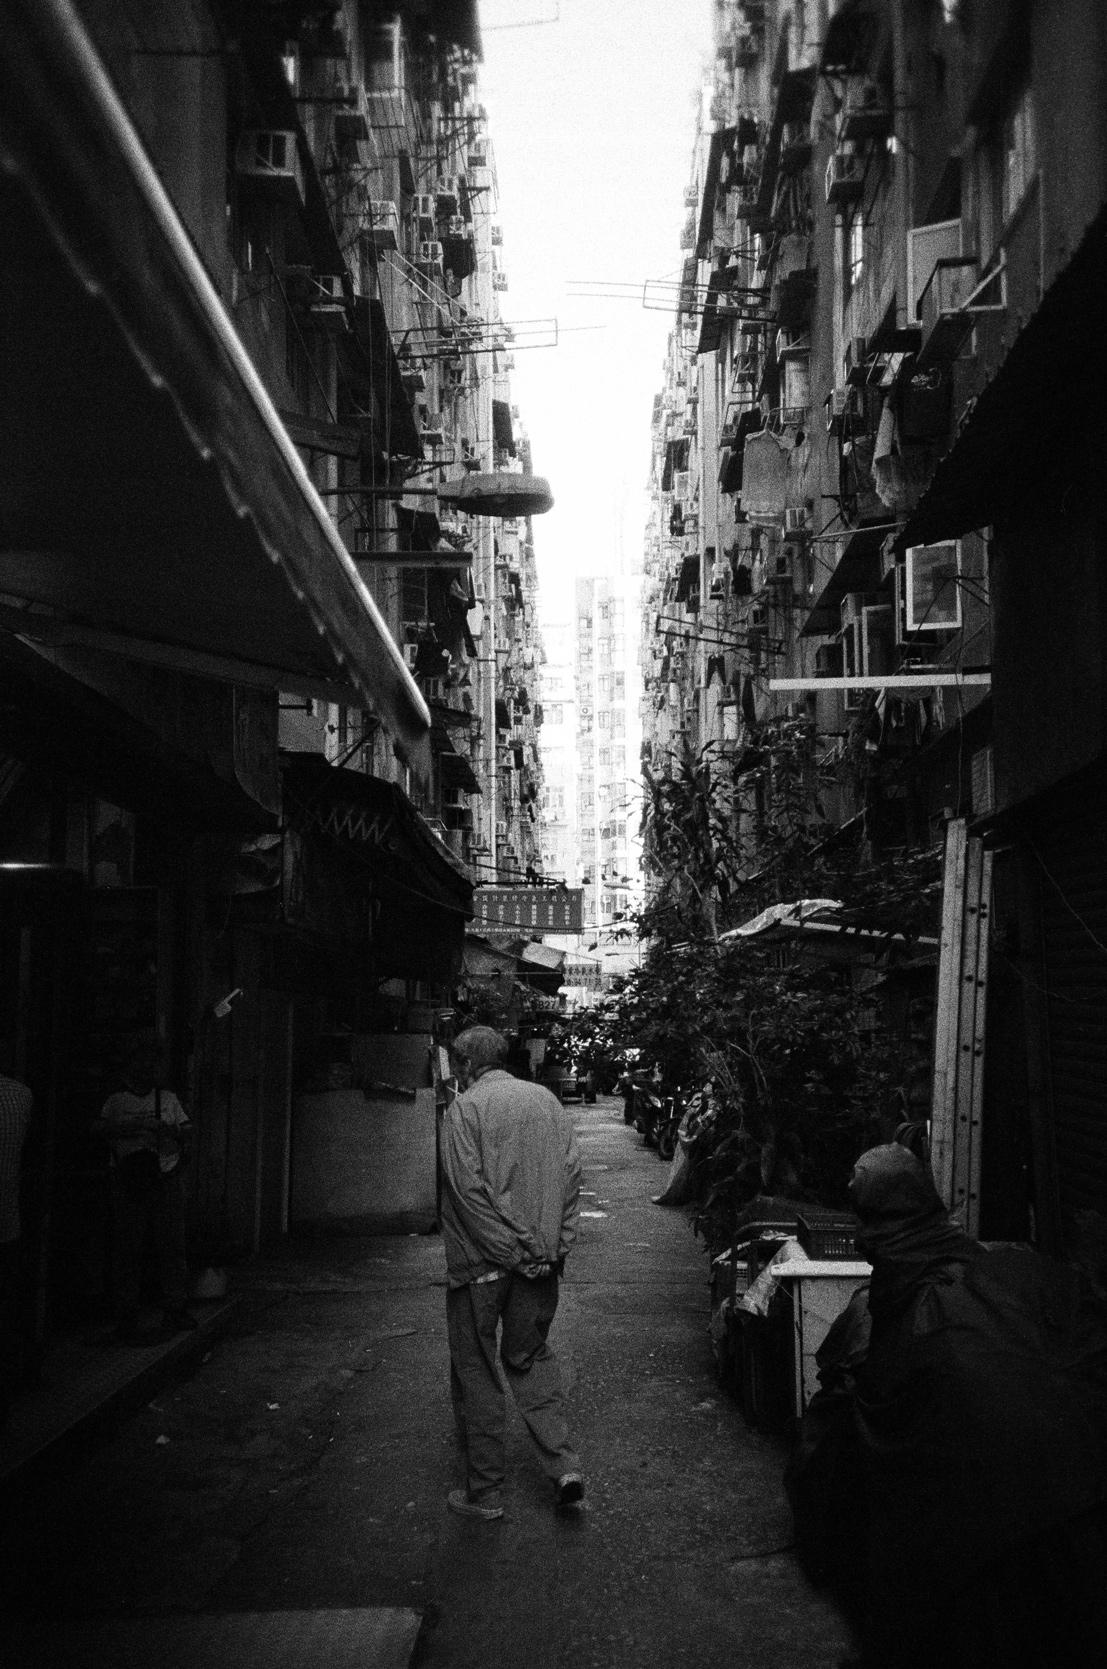 20181105_HK_Sunnly-Liu_bnw-400_LCA_24